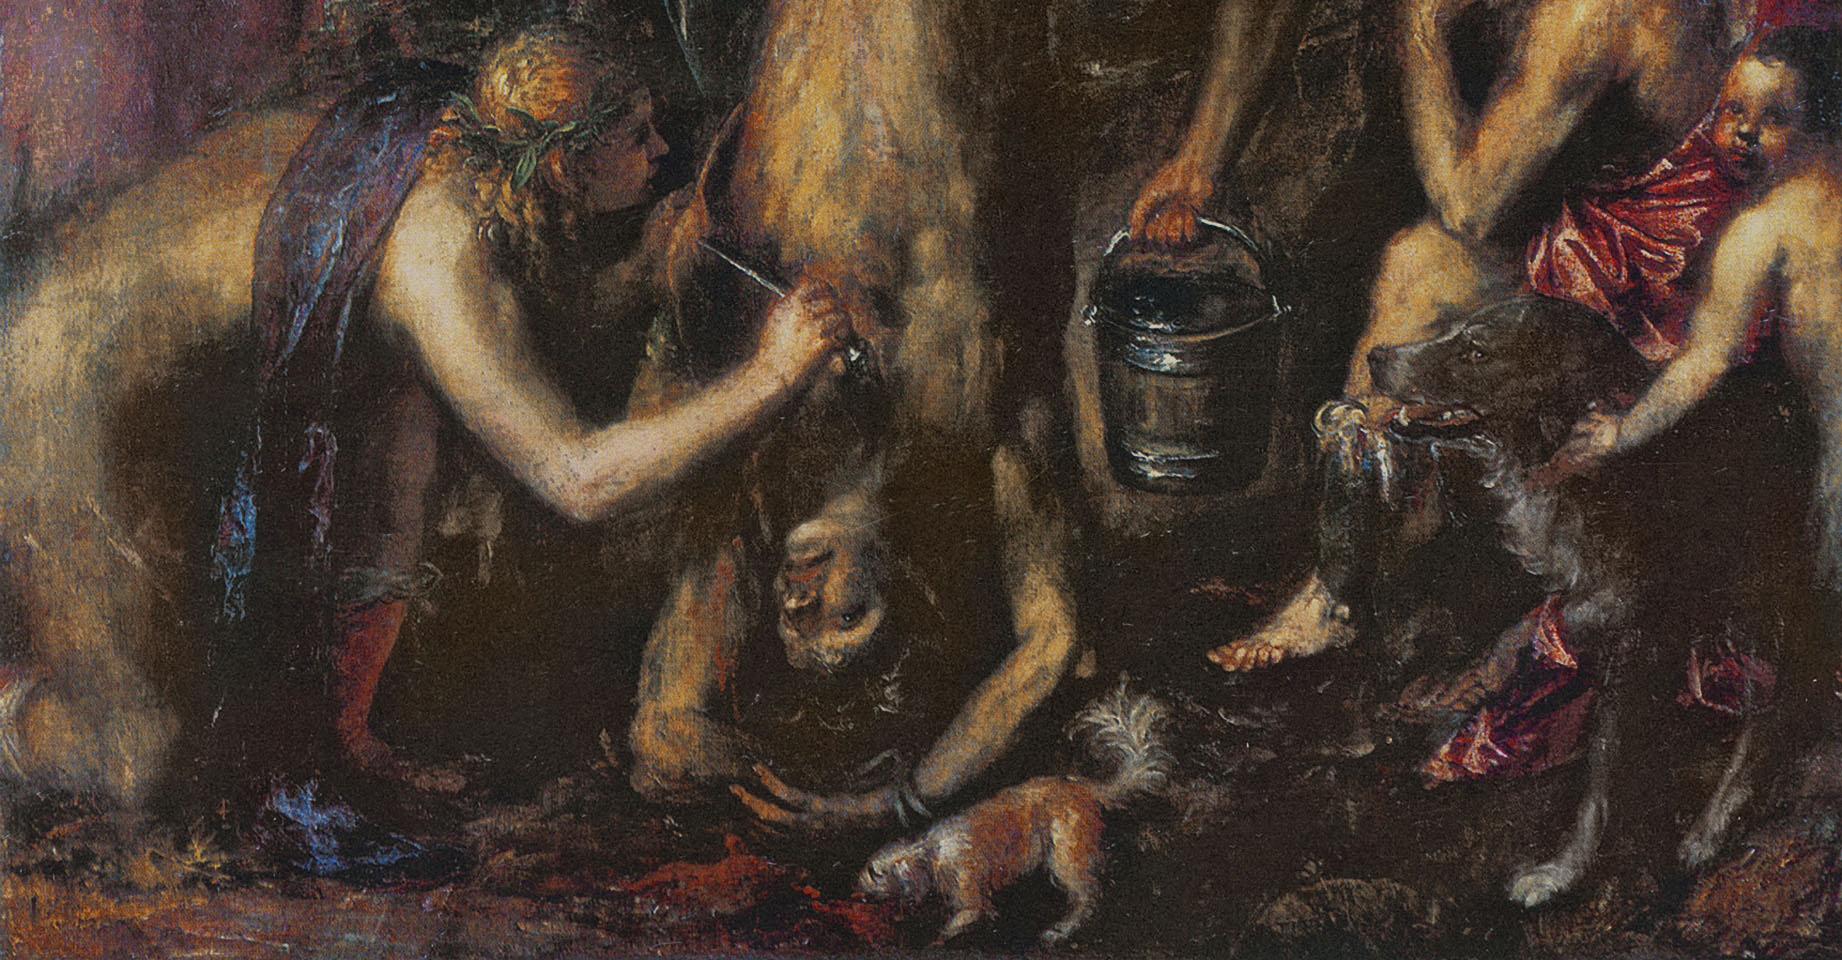 'Castigo de Marsias', detalle - Tiziano, c. 1570-1576 - Foto: Creative Commons